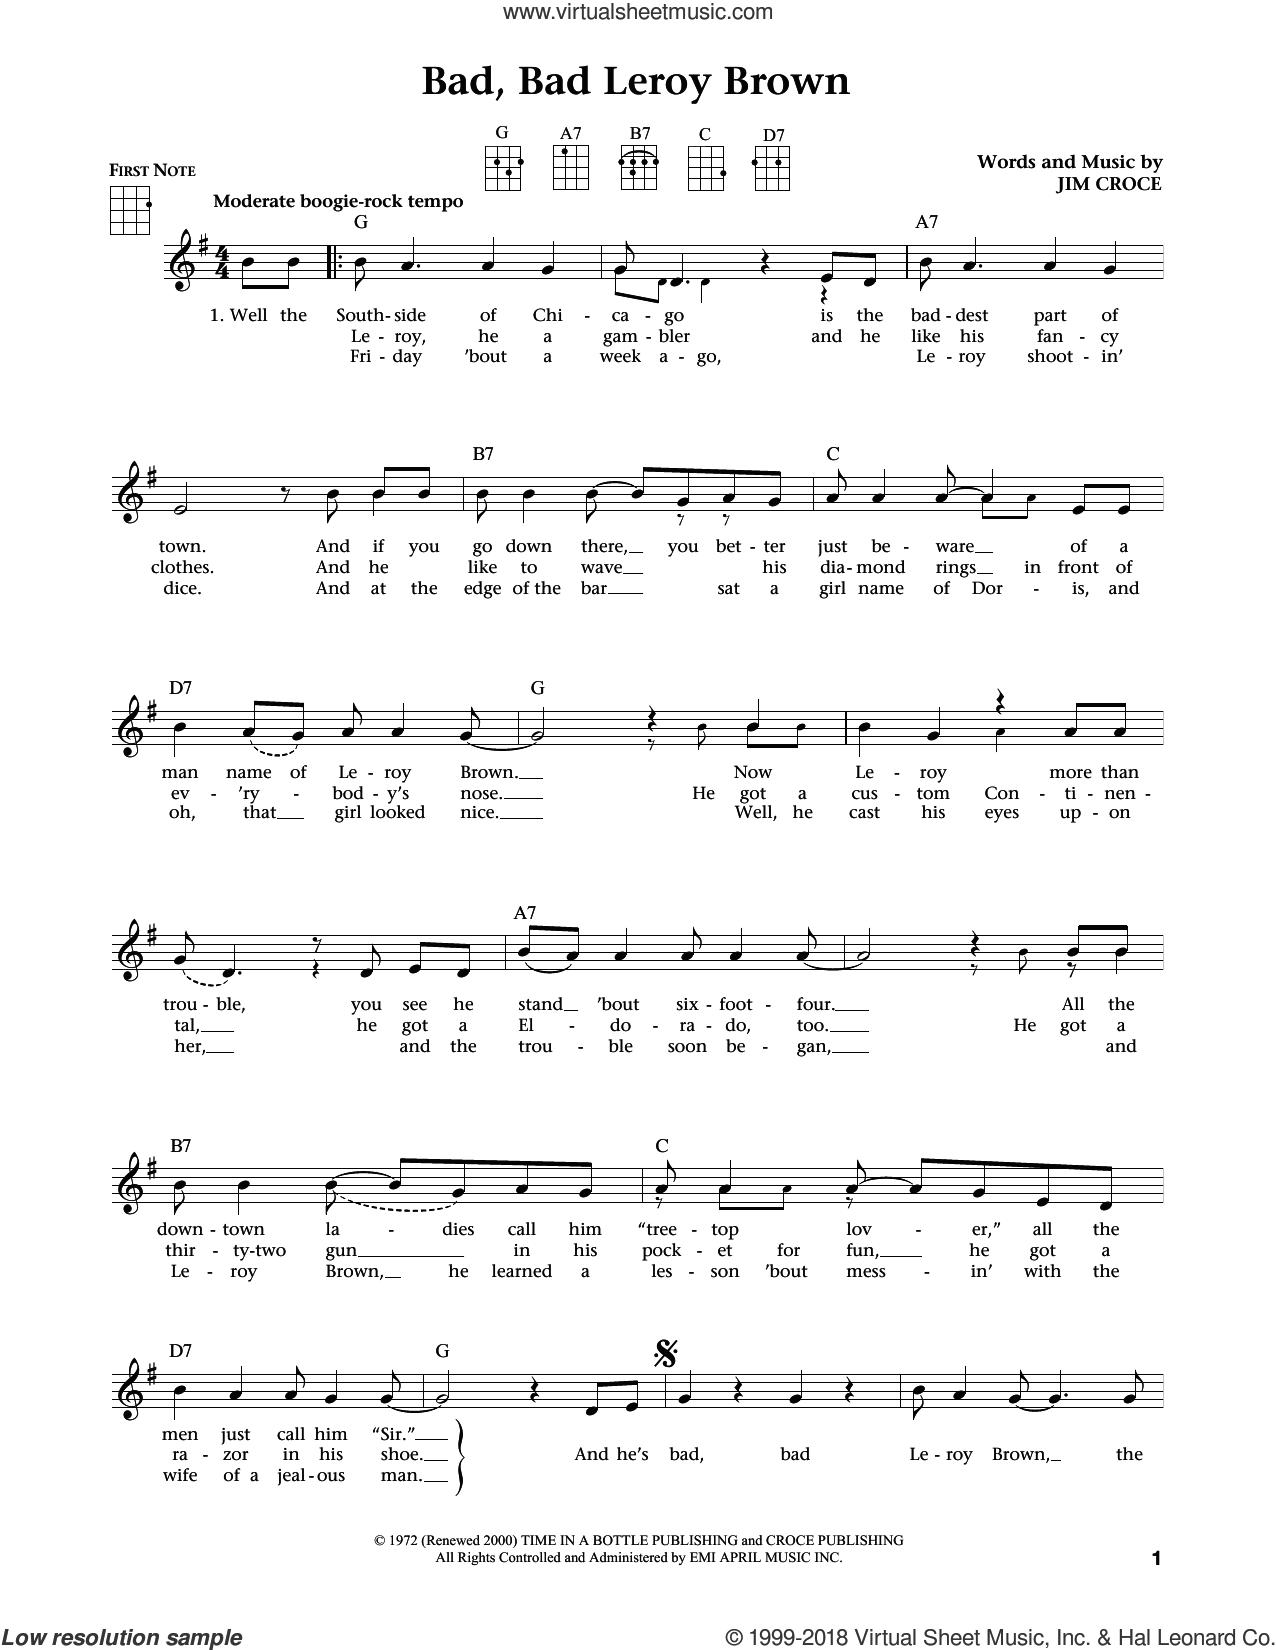 Bad, Bad Leroy Brown (from The Daily Ukulele) (arr. Liz and Jim Beloff) sheet music for ukulele by Jim Croce, Jim Beloff and Liz Beloff, intermediate skill level